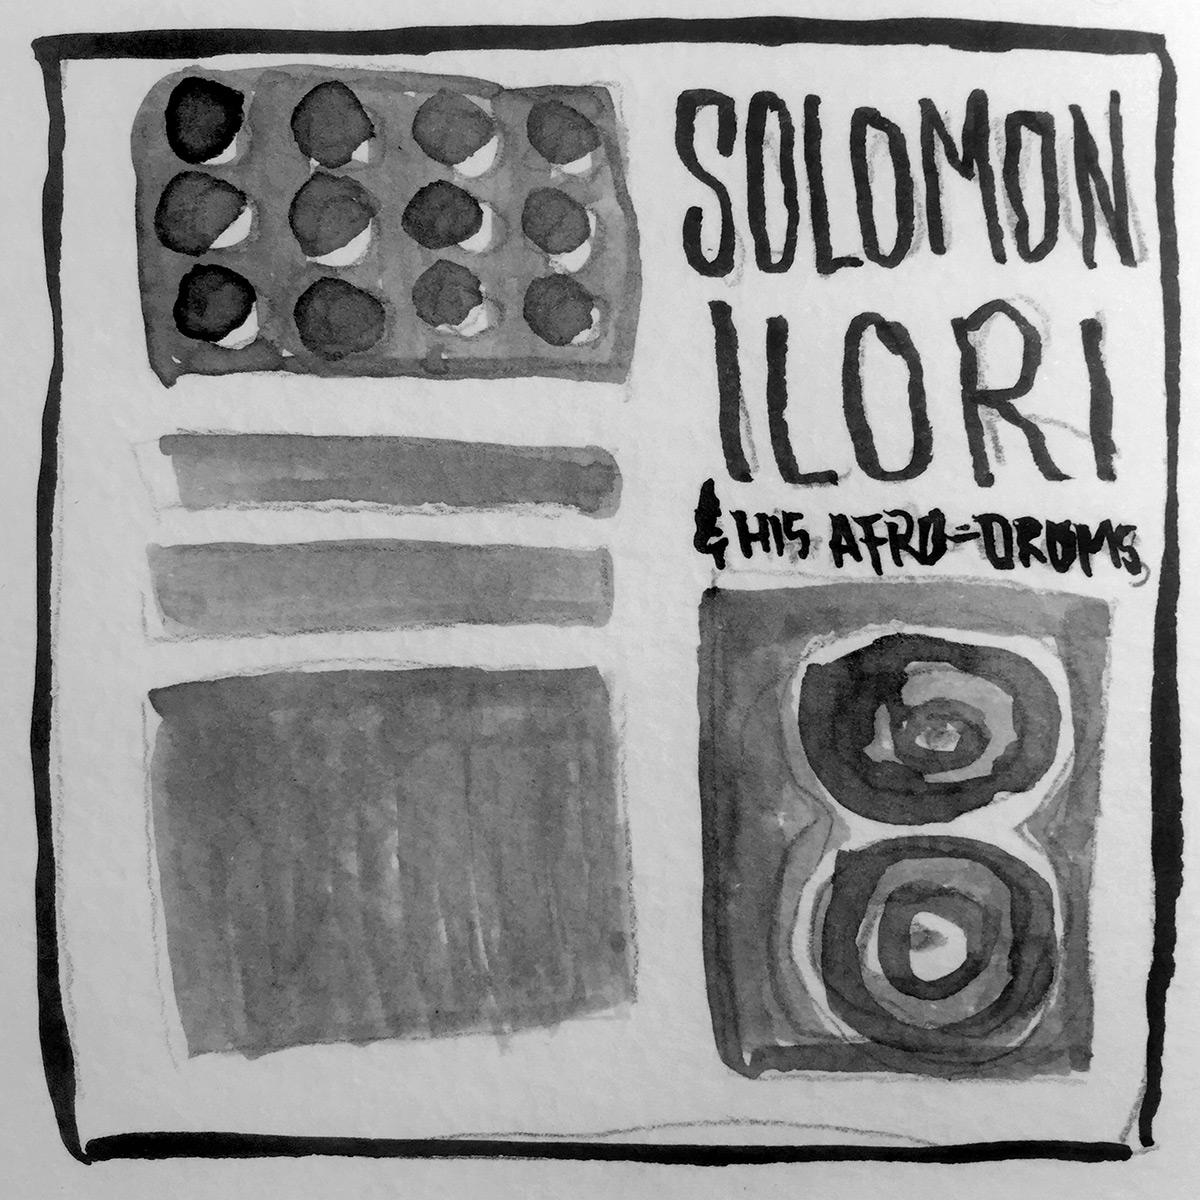 Solomon Ilori and his Afro Drum Ensemble